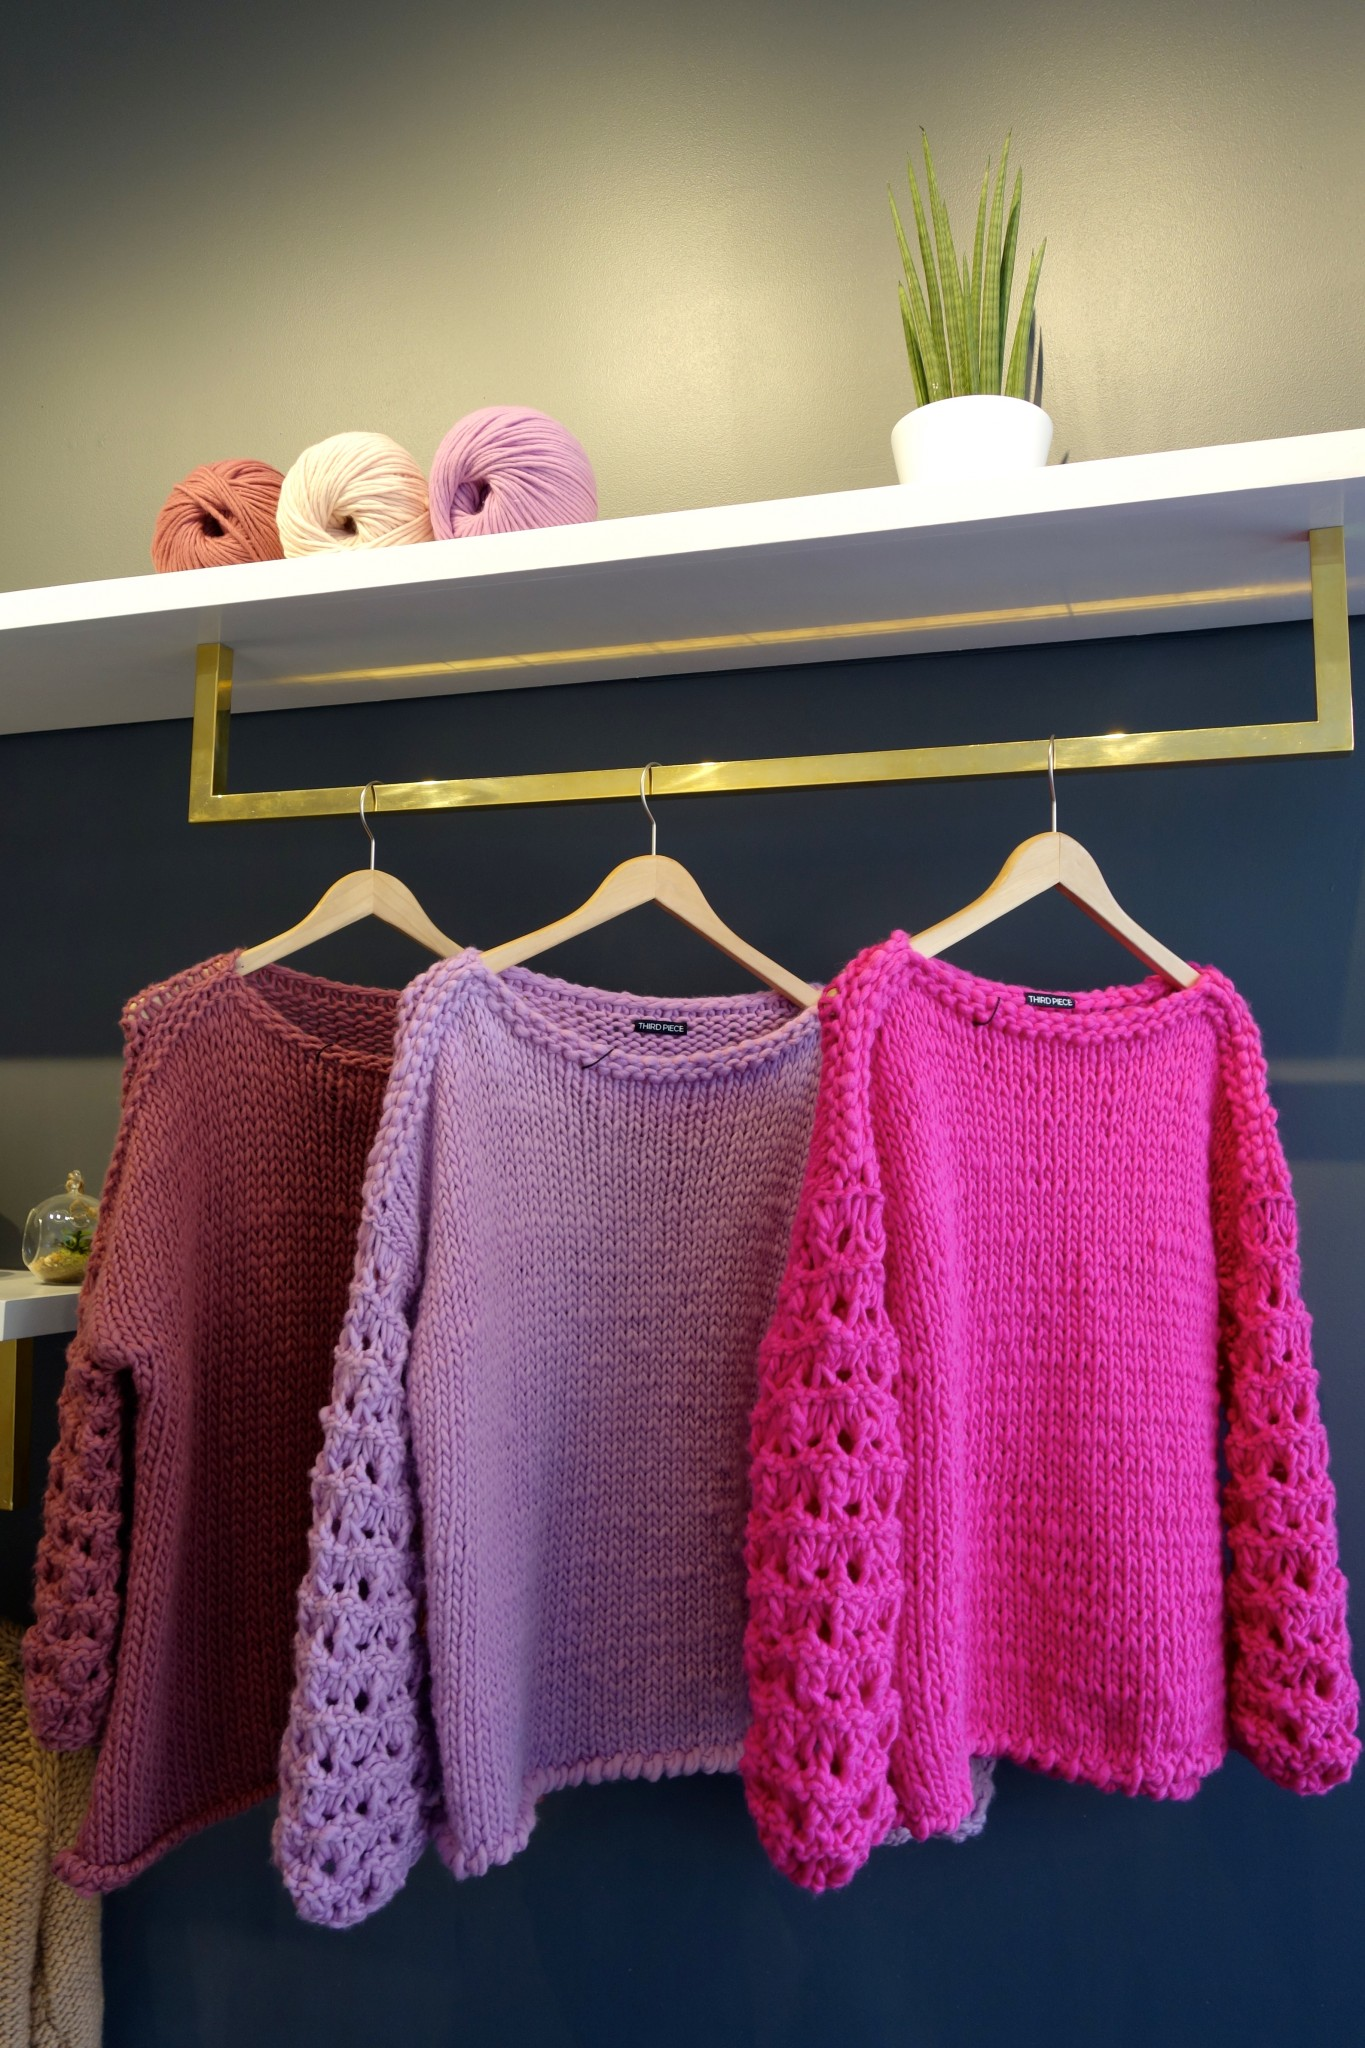 knit sweaters, boston, third piece, the-alyst.com